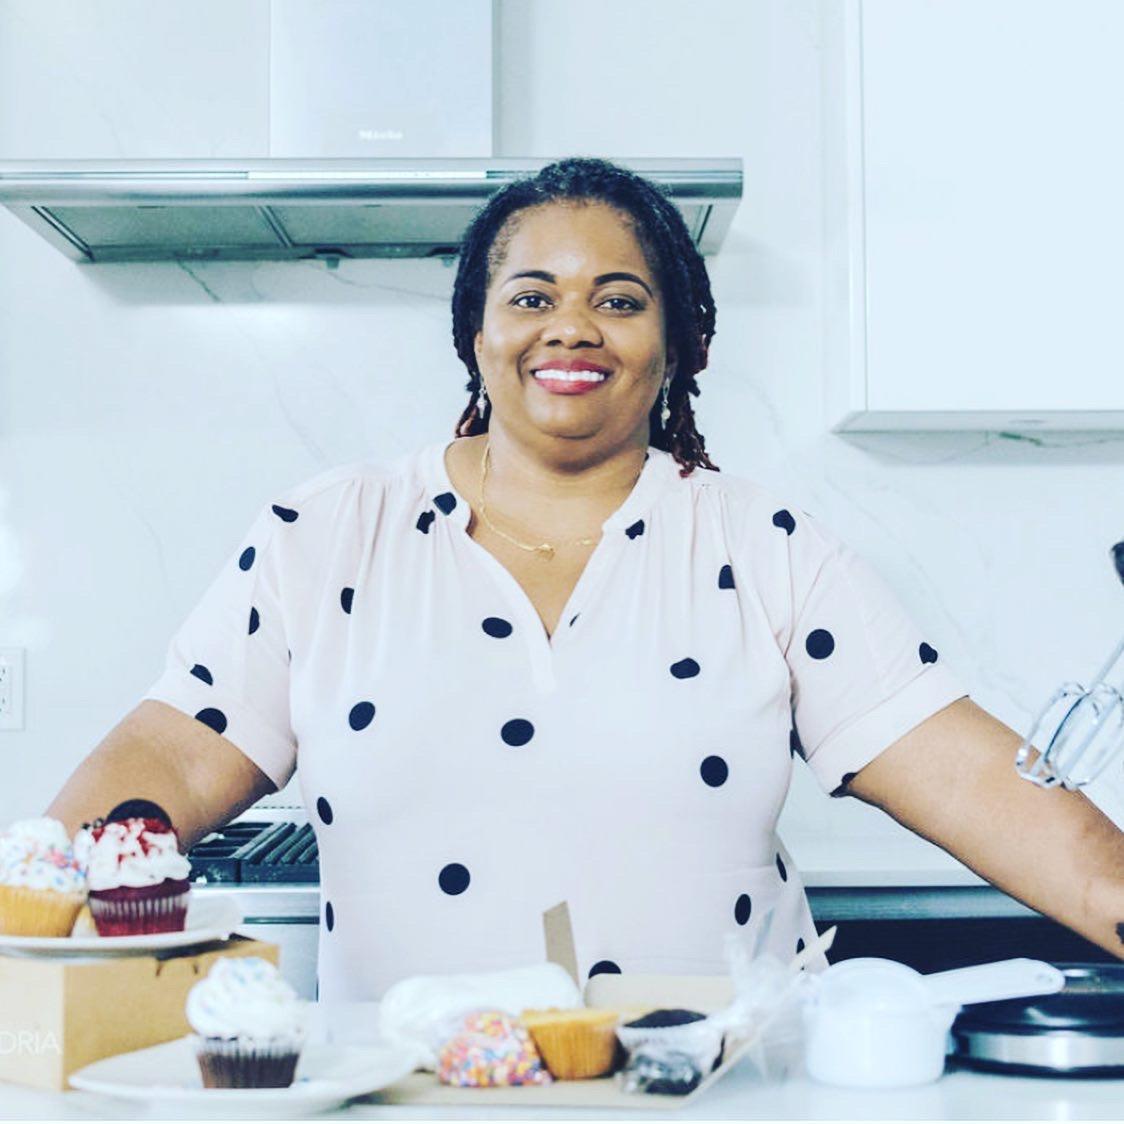 Shantell Penn—Sheshe's Cupcakerie: Nassau, Bahamas